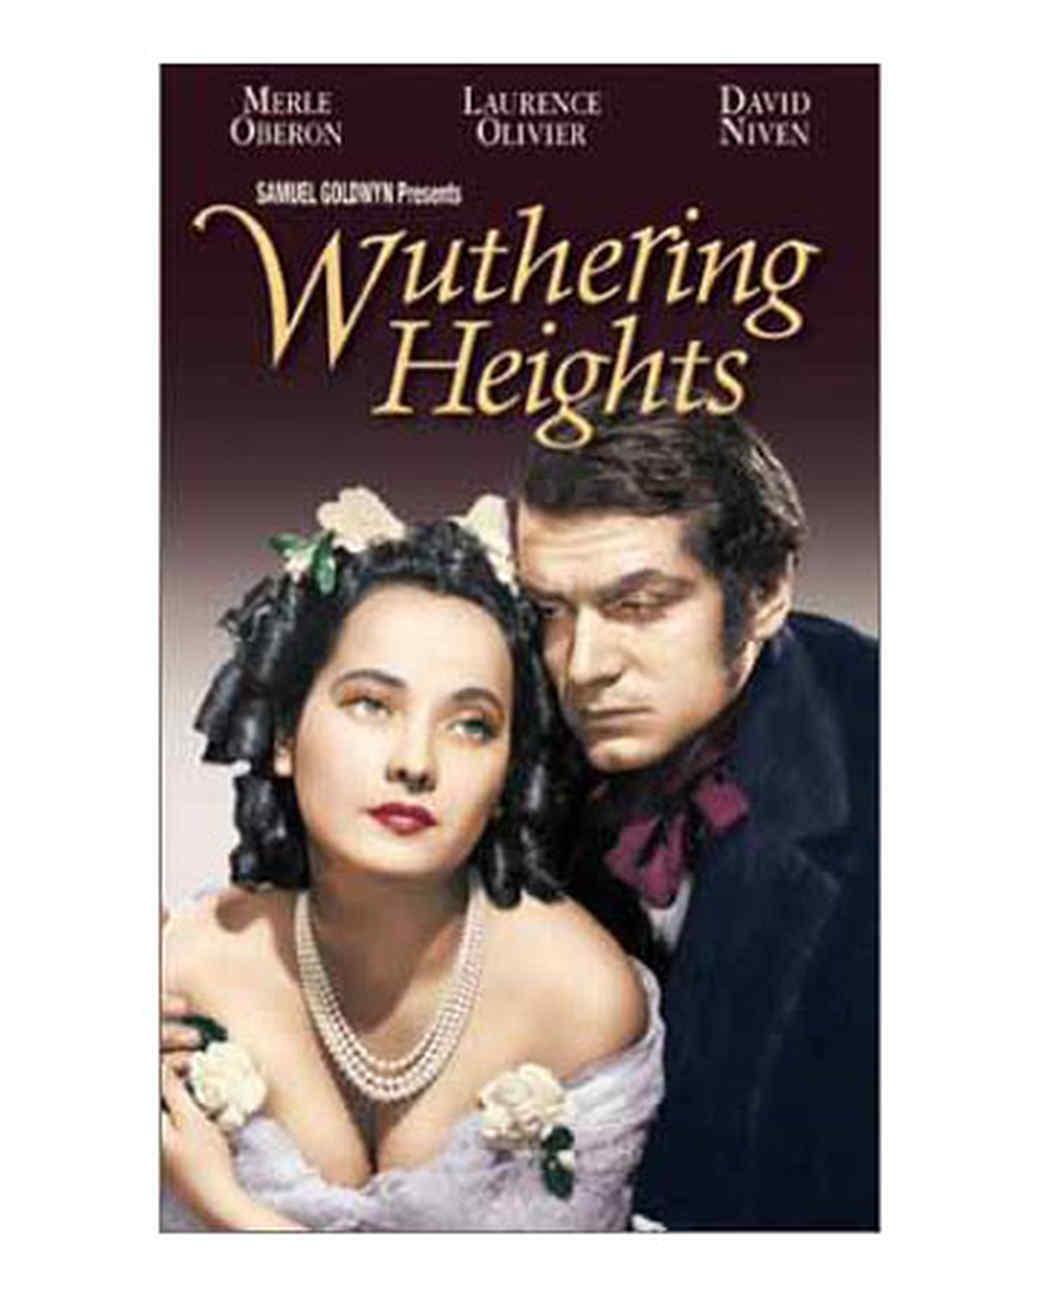 stock_movie_stills_wuthering_heights.jpg